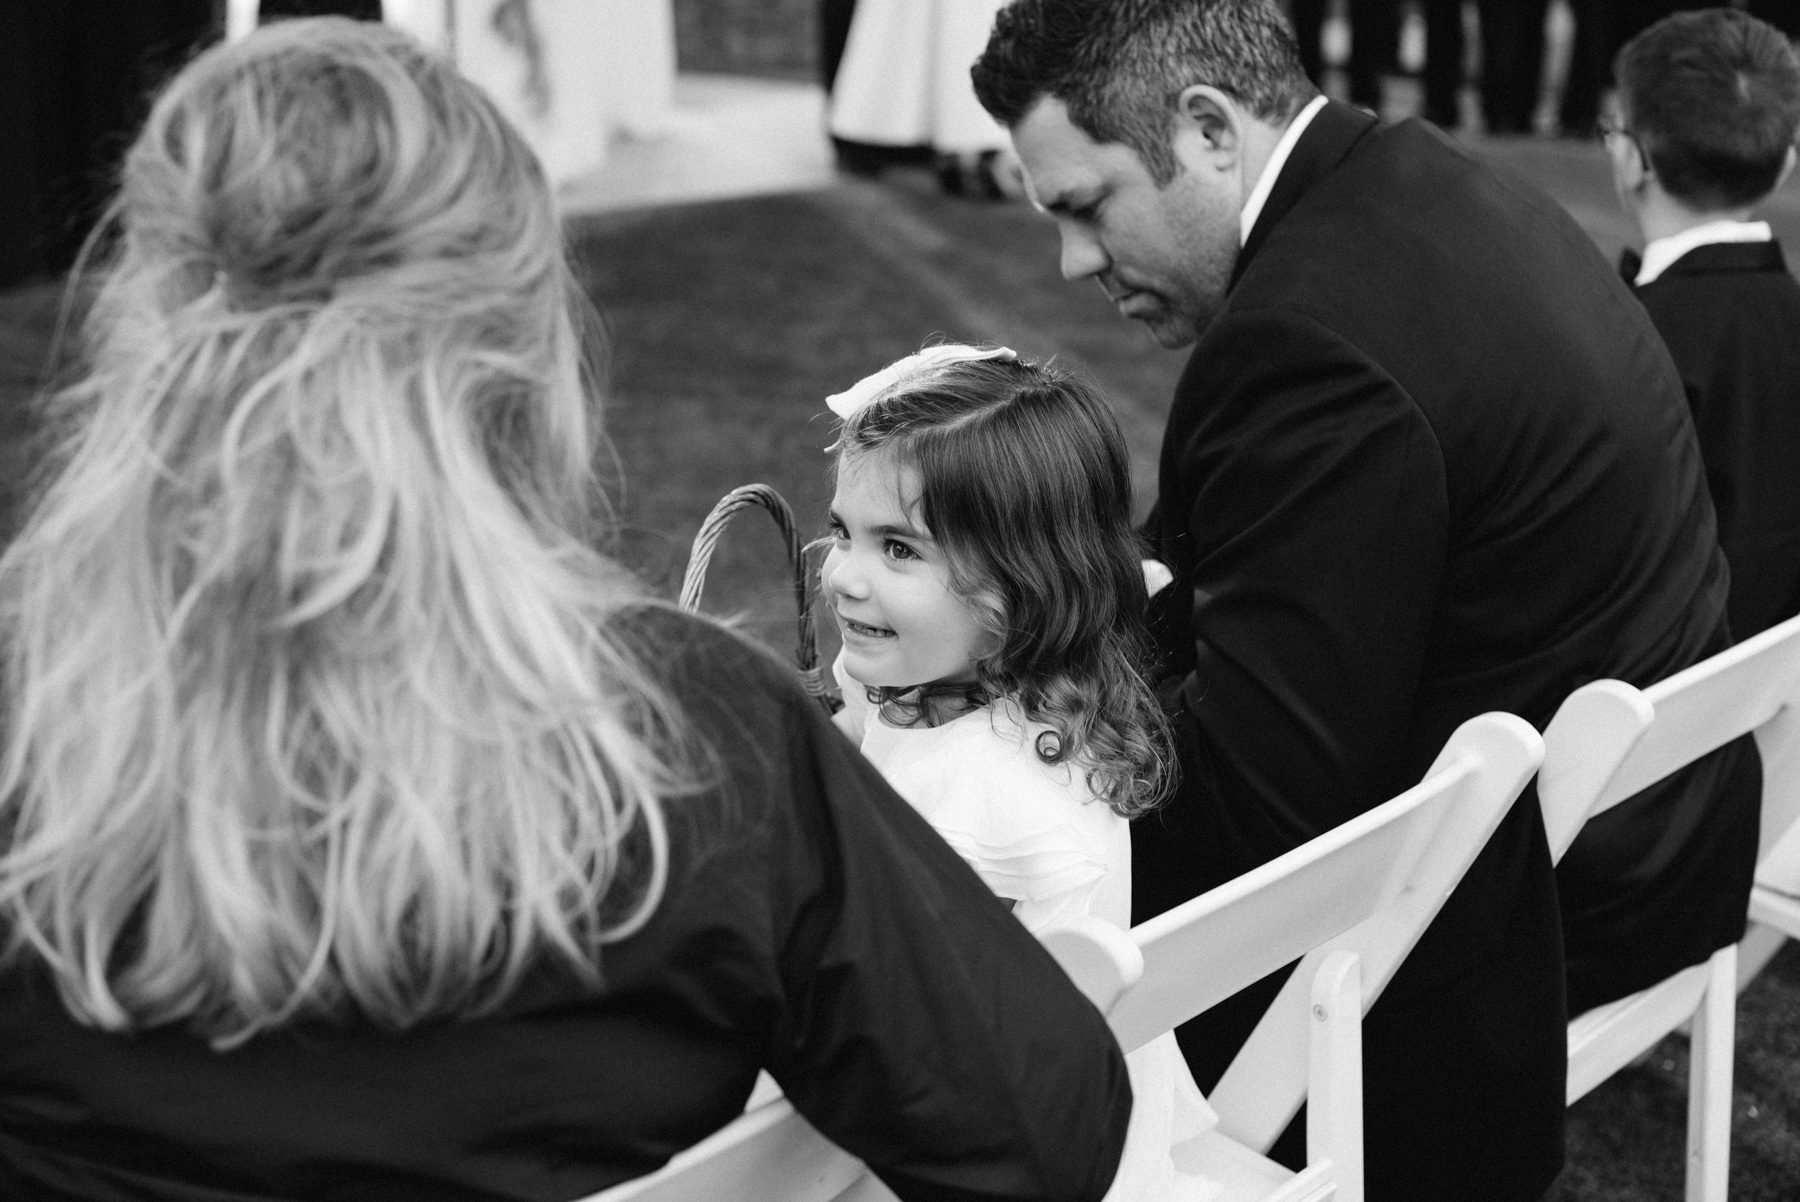 Secret Garden Event Center Wedding - Meredith Amadee Photography-93.jpg